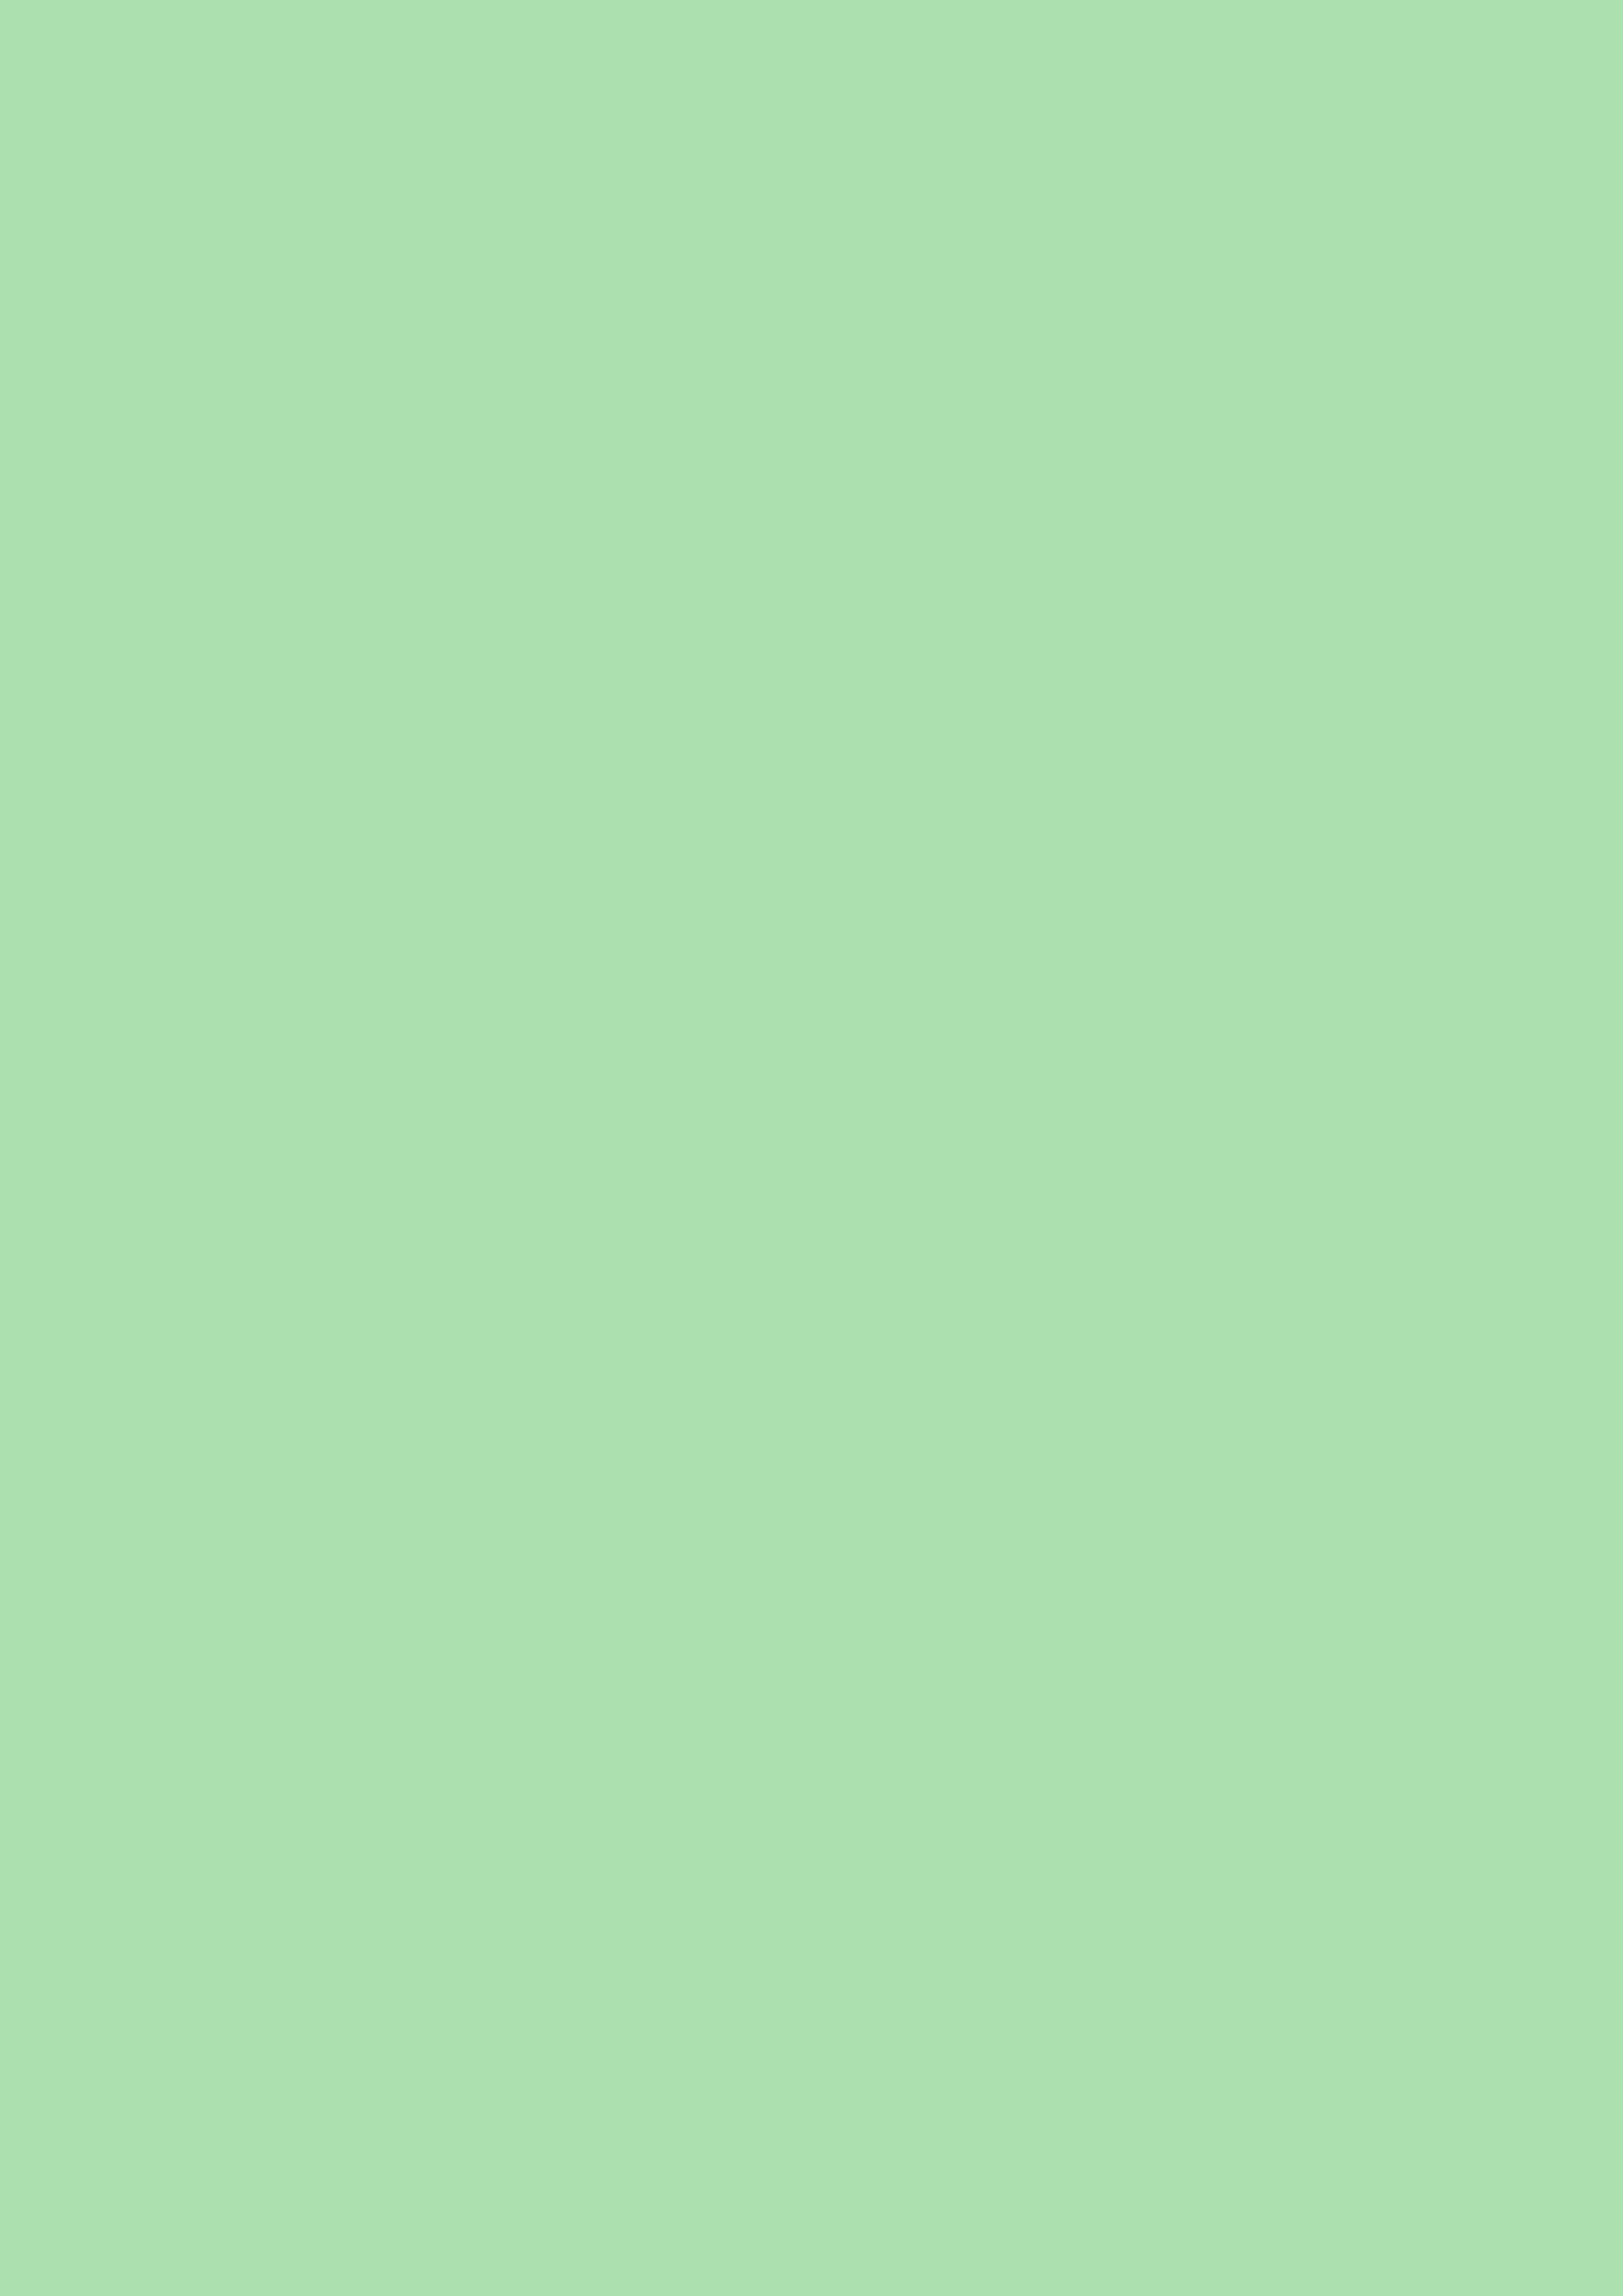 2480x3508 Celadon Solid Color Background